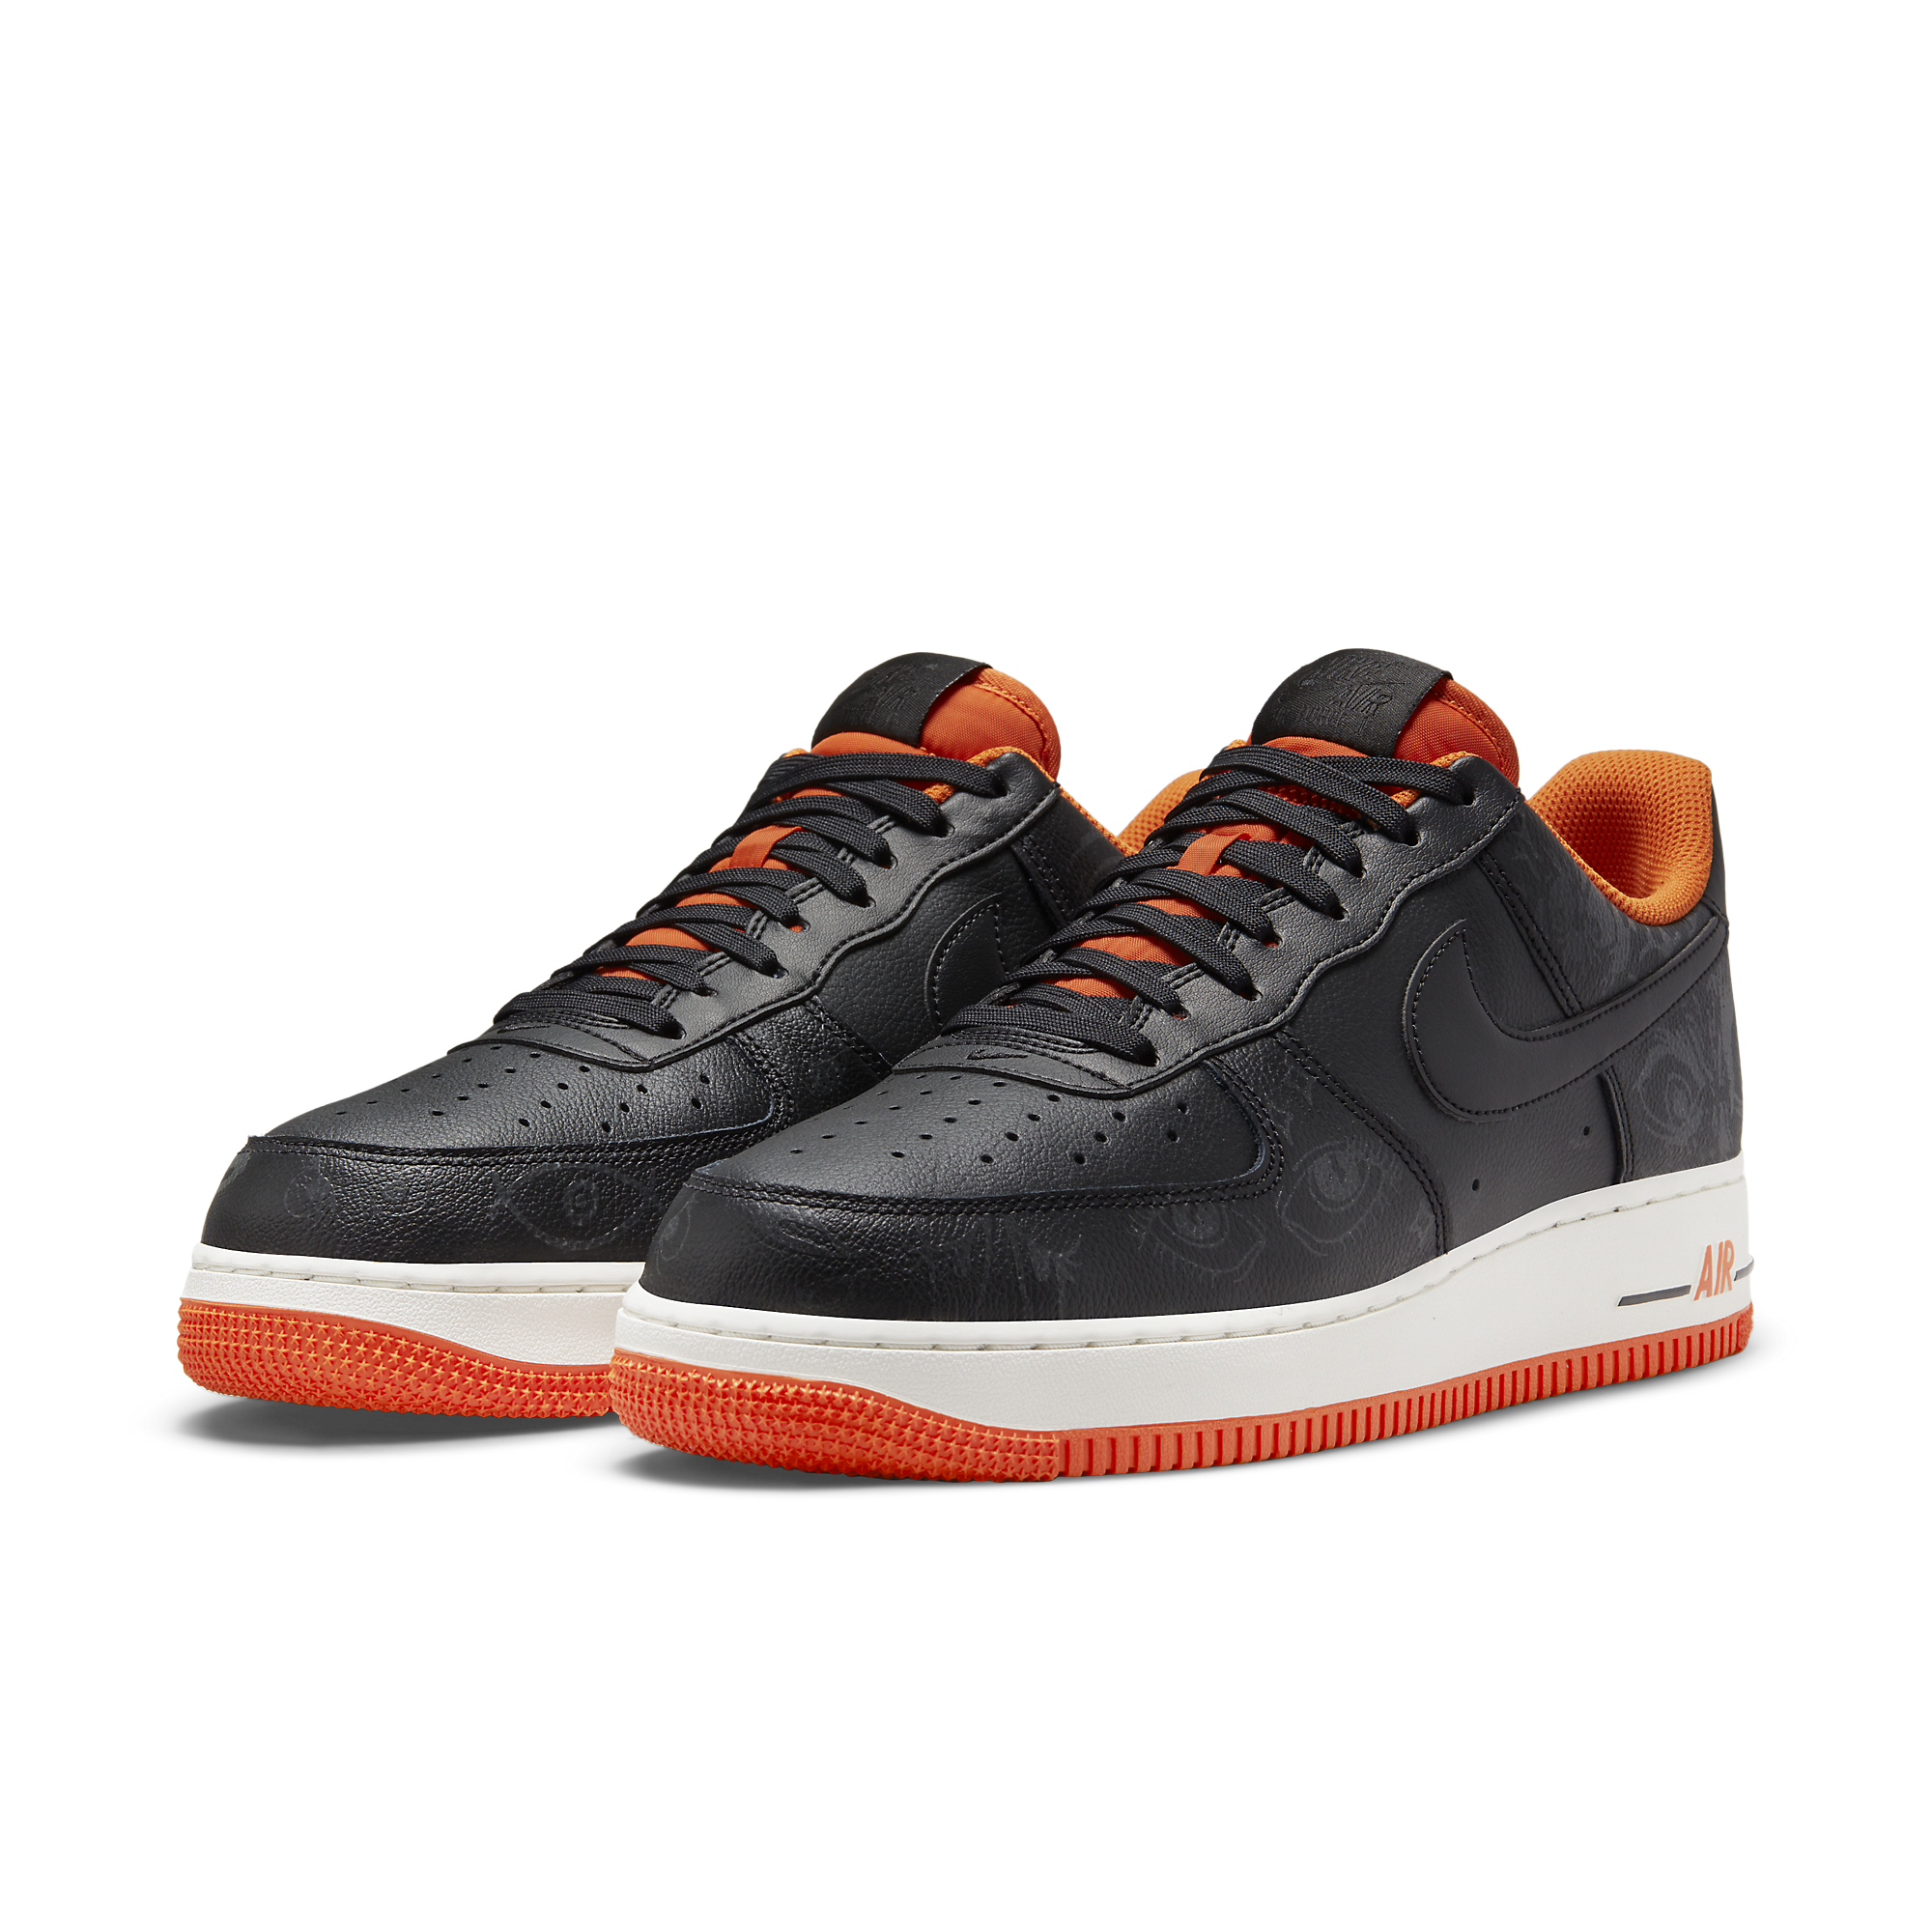 Nike Air Force 1 'Halloween'